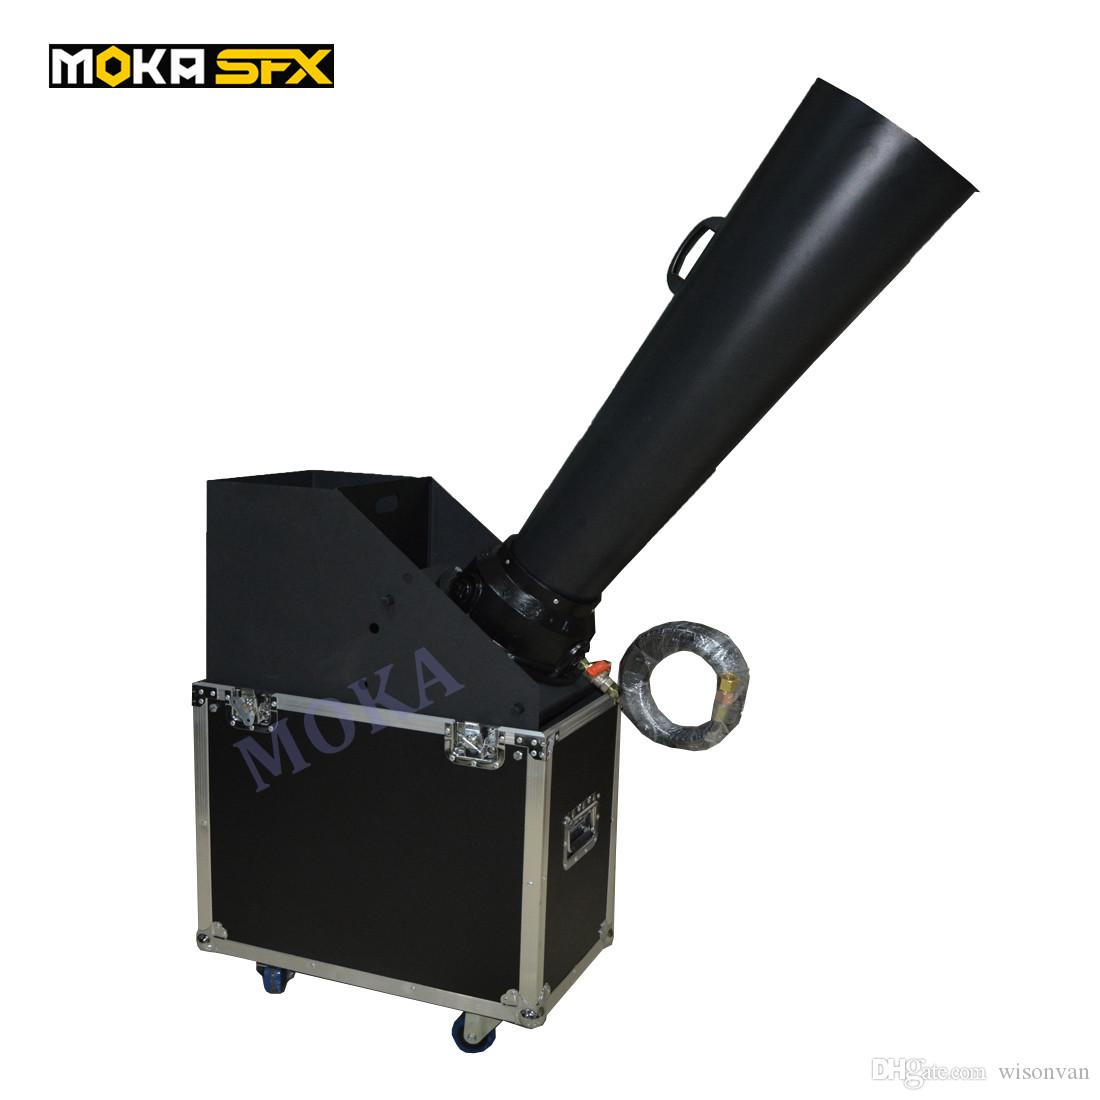 Flight Case Packing CO2 Confetti Cannon Machine Confetti Blaster Hand Control For Party Club Stage Aluminium Cast co2 gas cannon